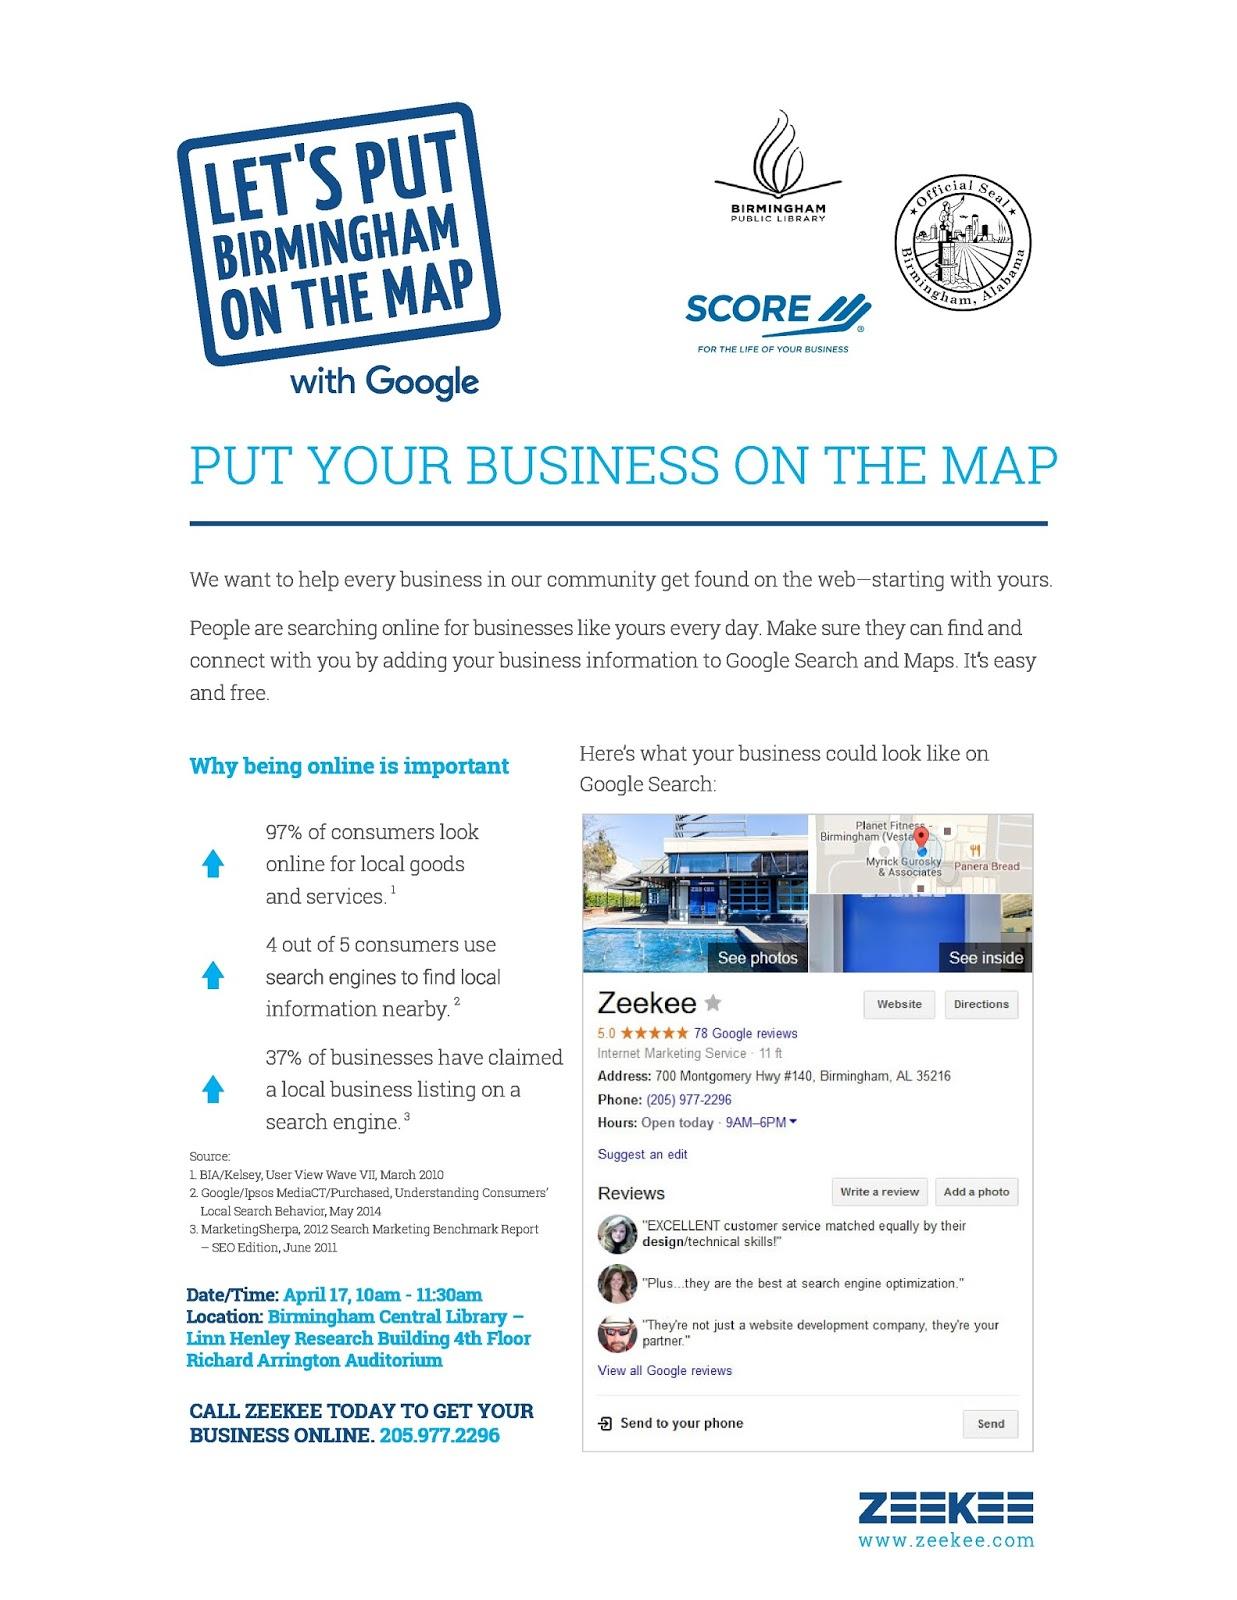 Birmingham Public Library: Get Your Business Online Workshop